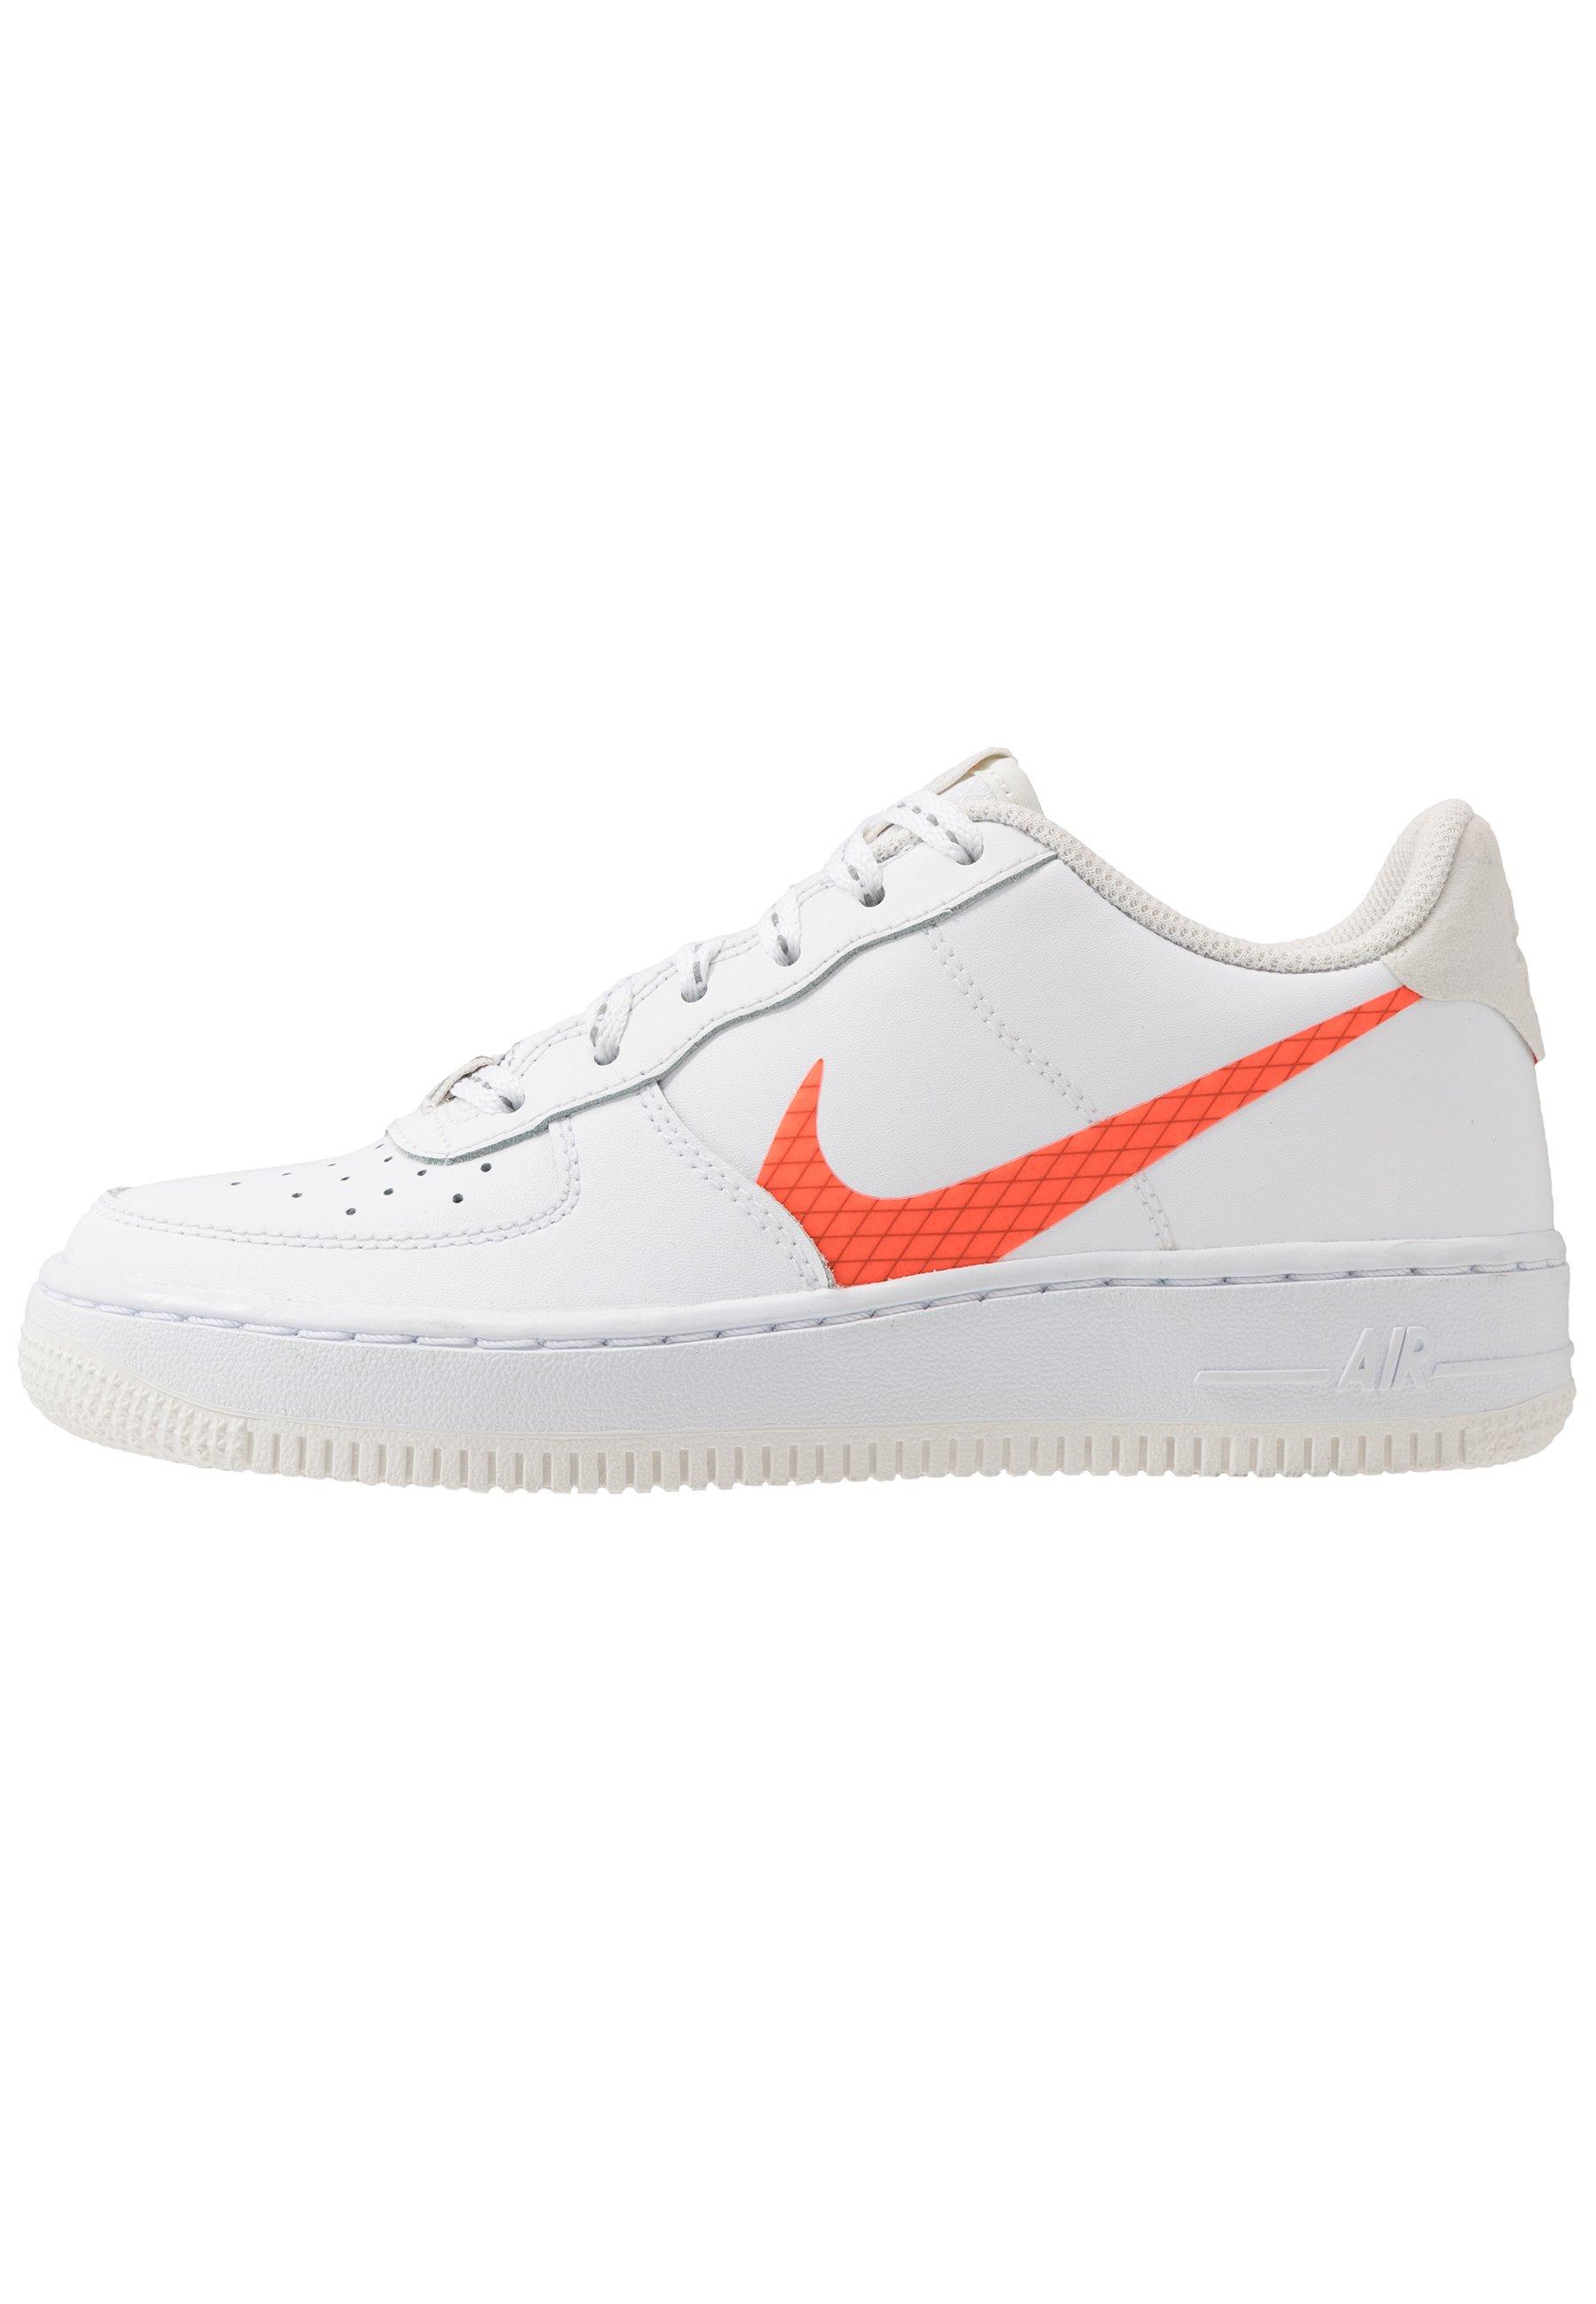 AIR FORCE 1 LV8 3 Sneakers laag whitetotal orangesummit whiteblack